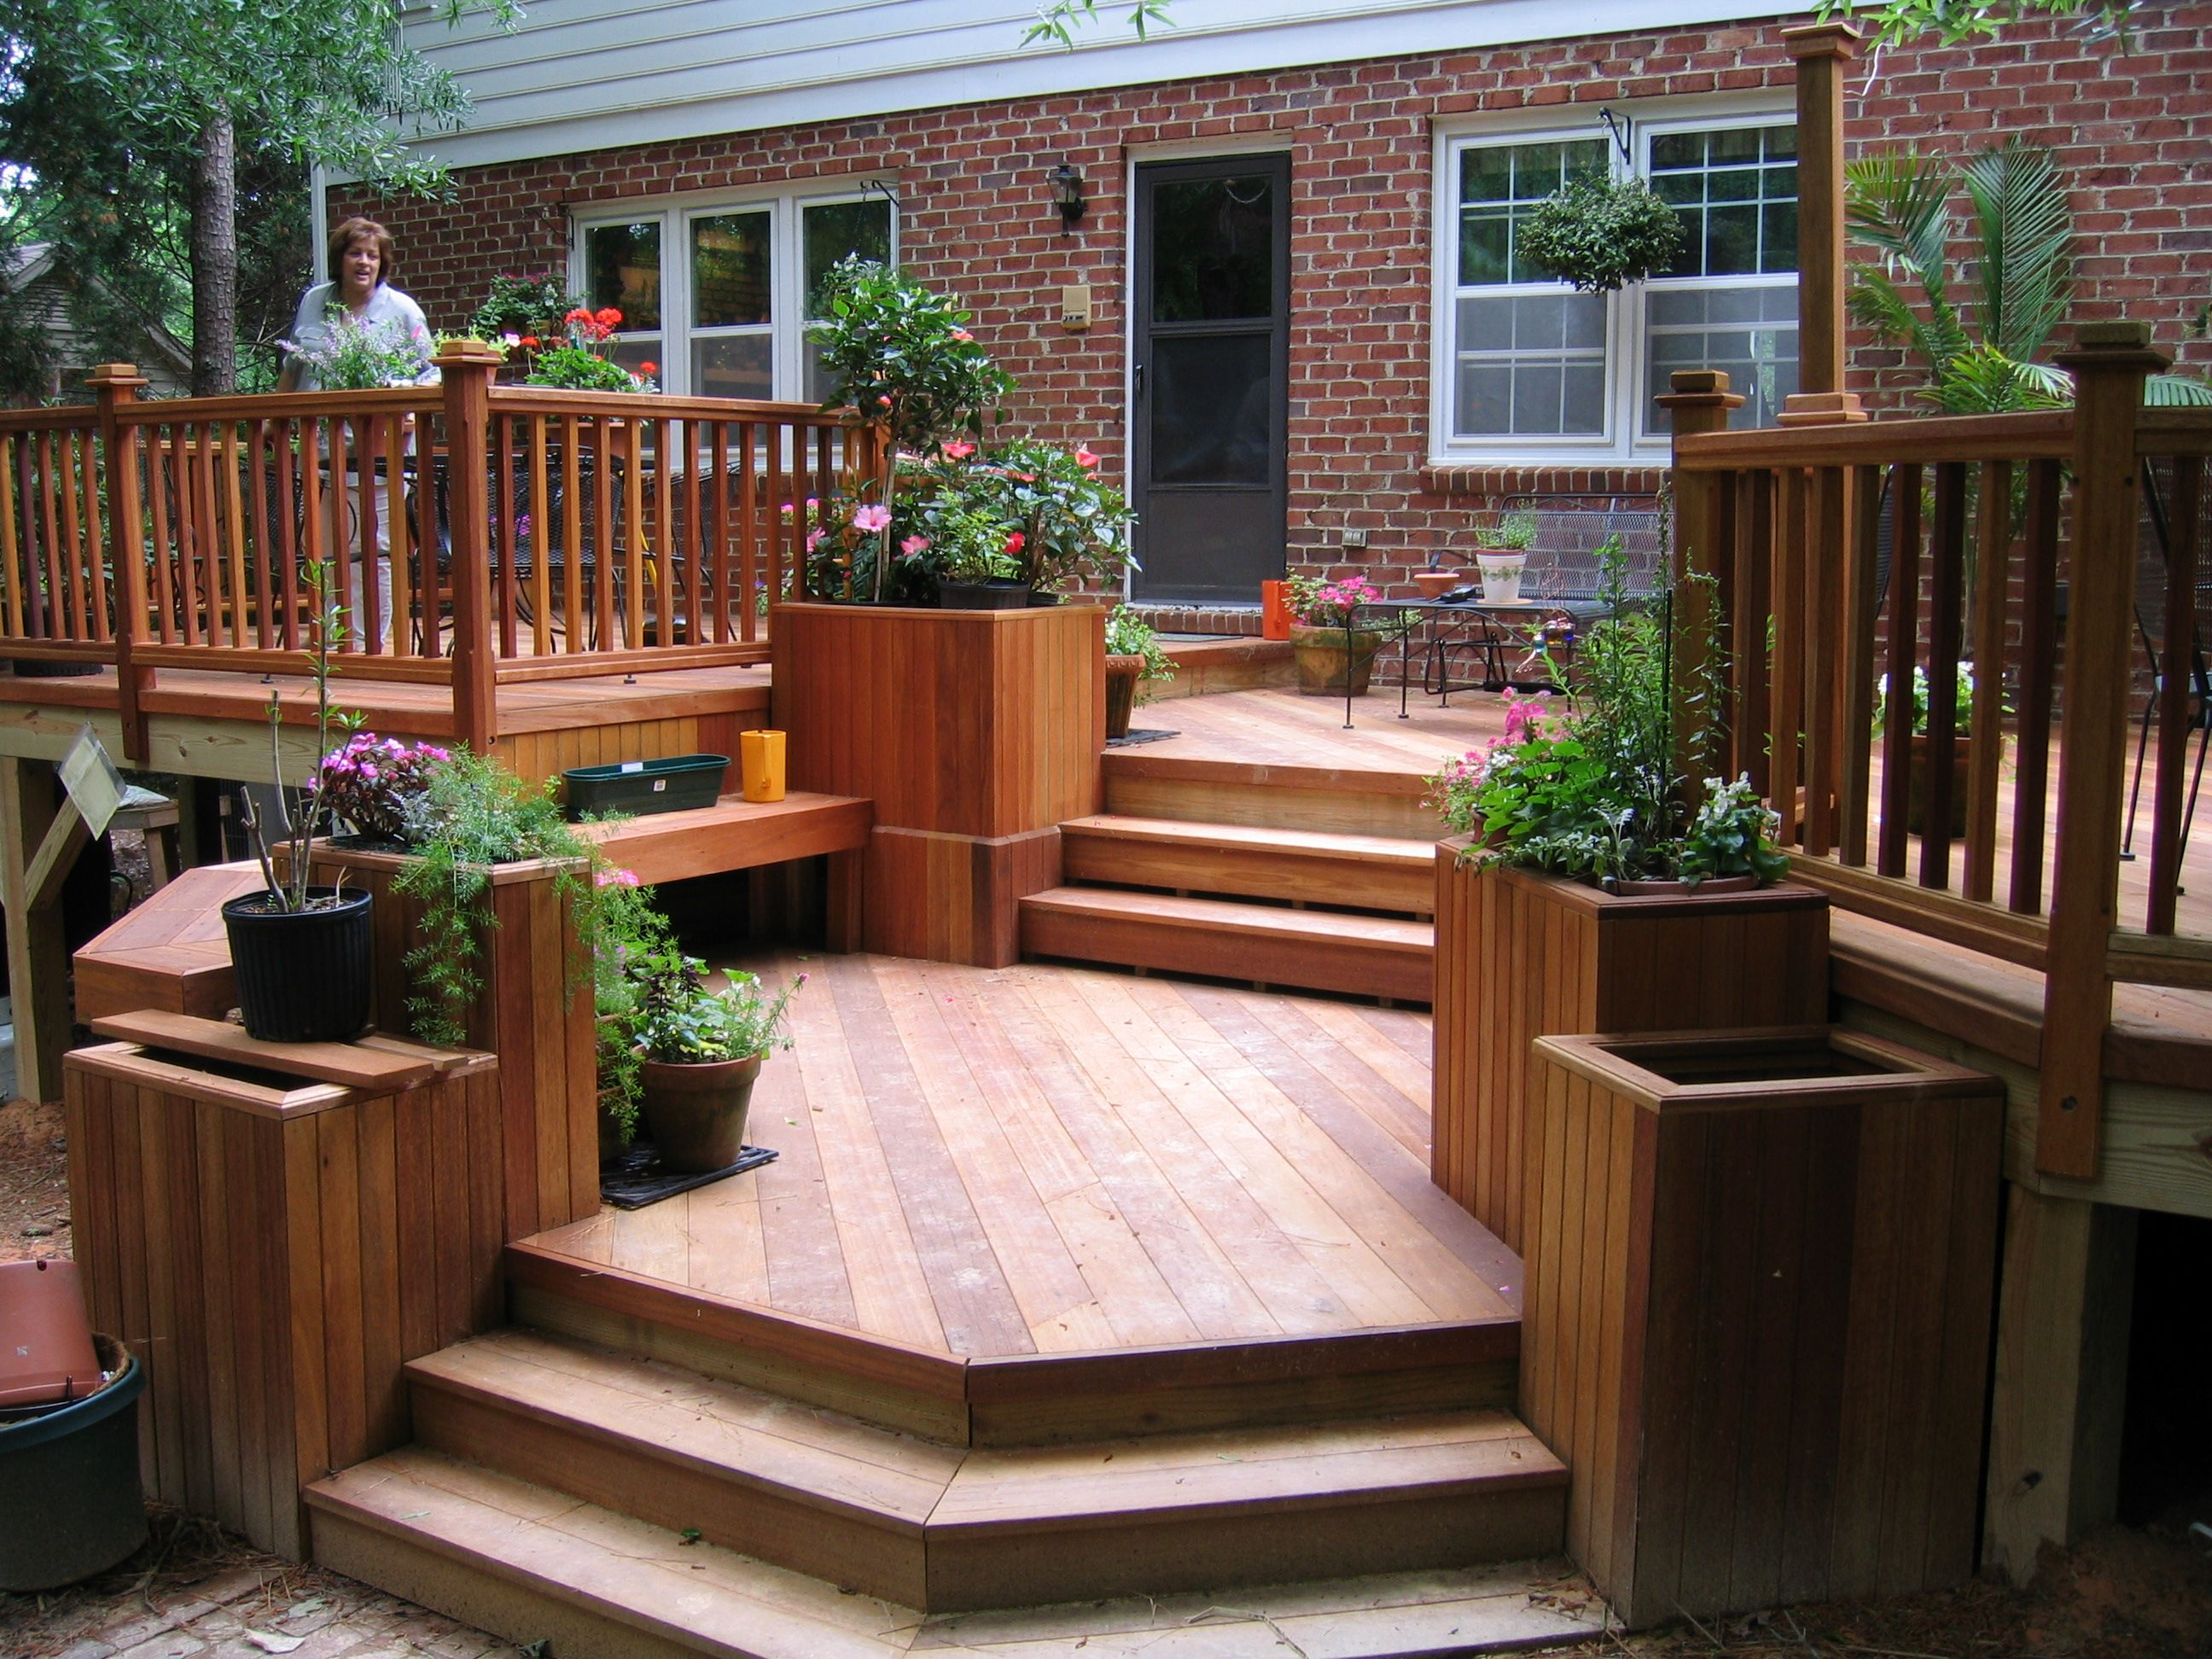 Hardwood Deck 3 Level Decks Backyard Patio Deck Designs Backyard Plan